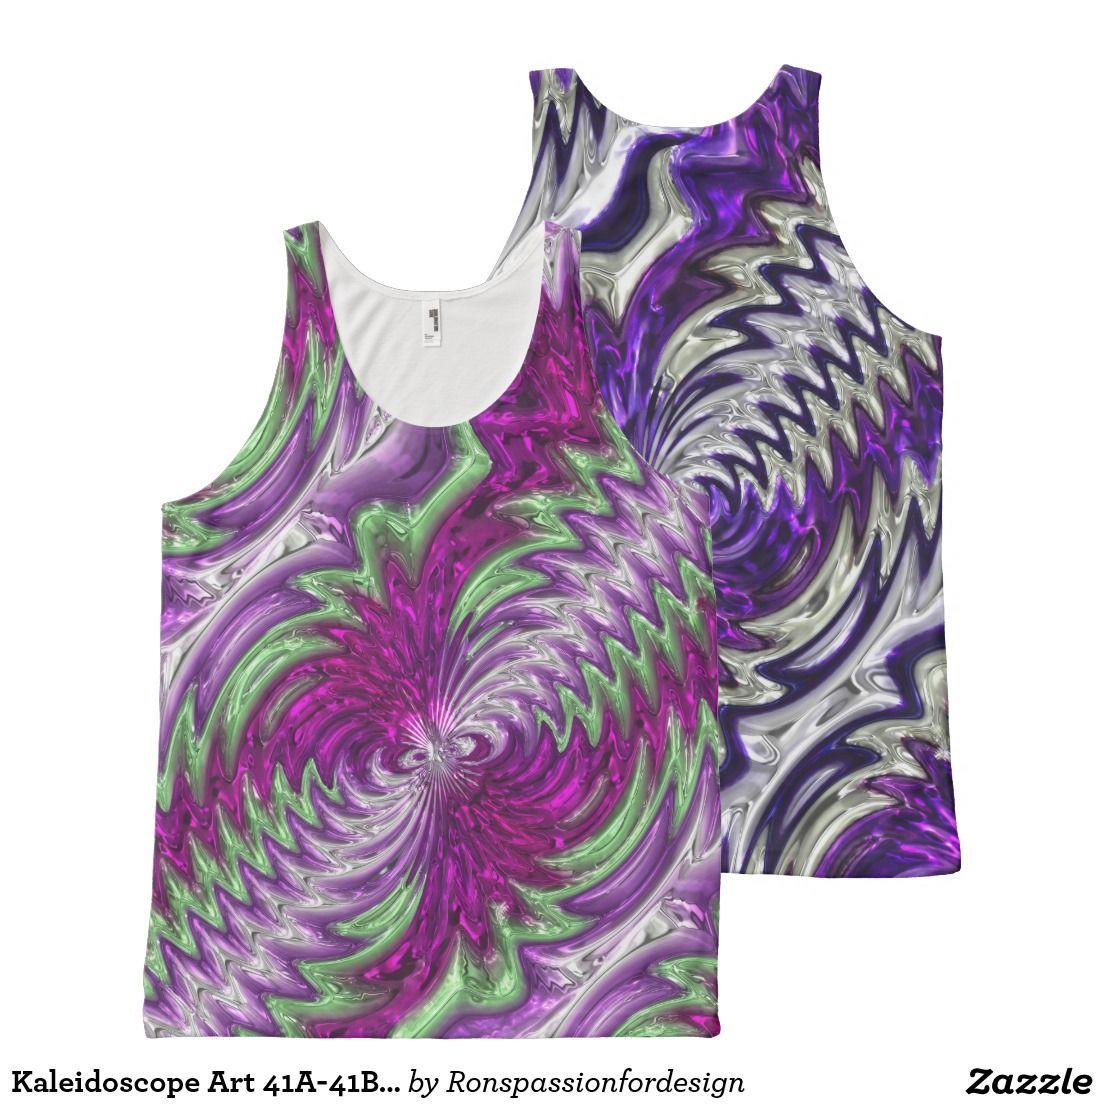 Kaleidoscope Art 41A-41B Options All-Over Print Tank Top